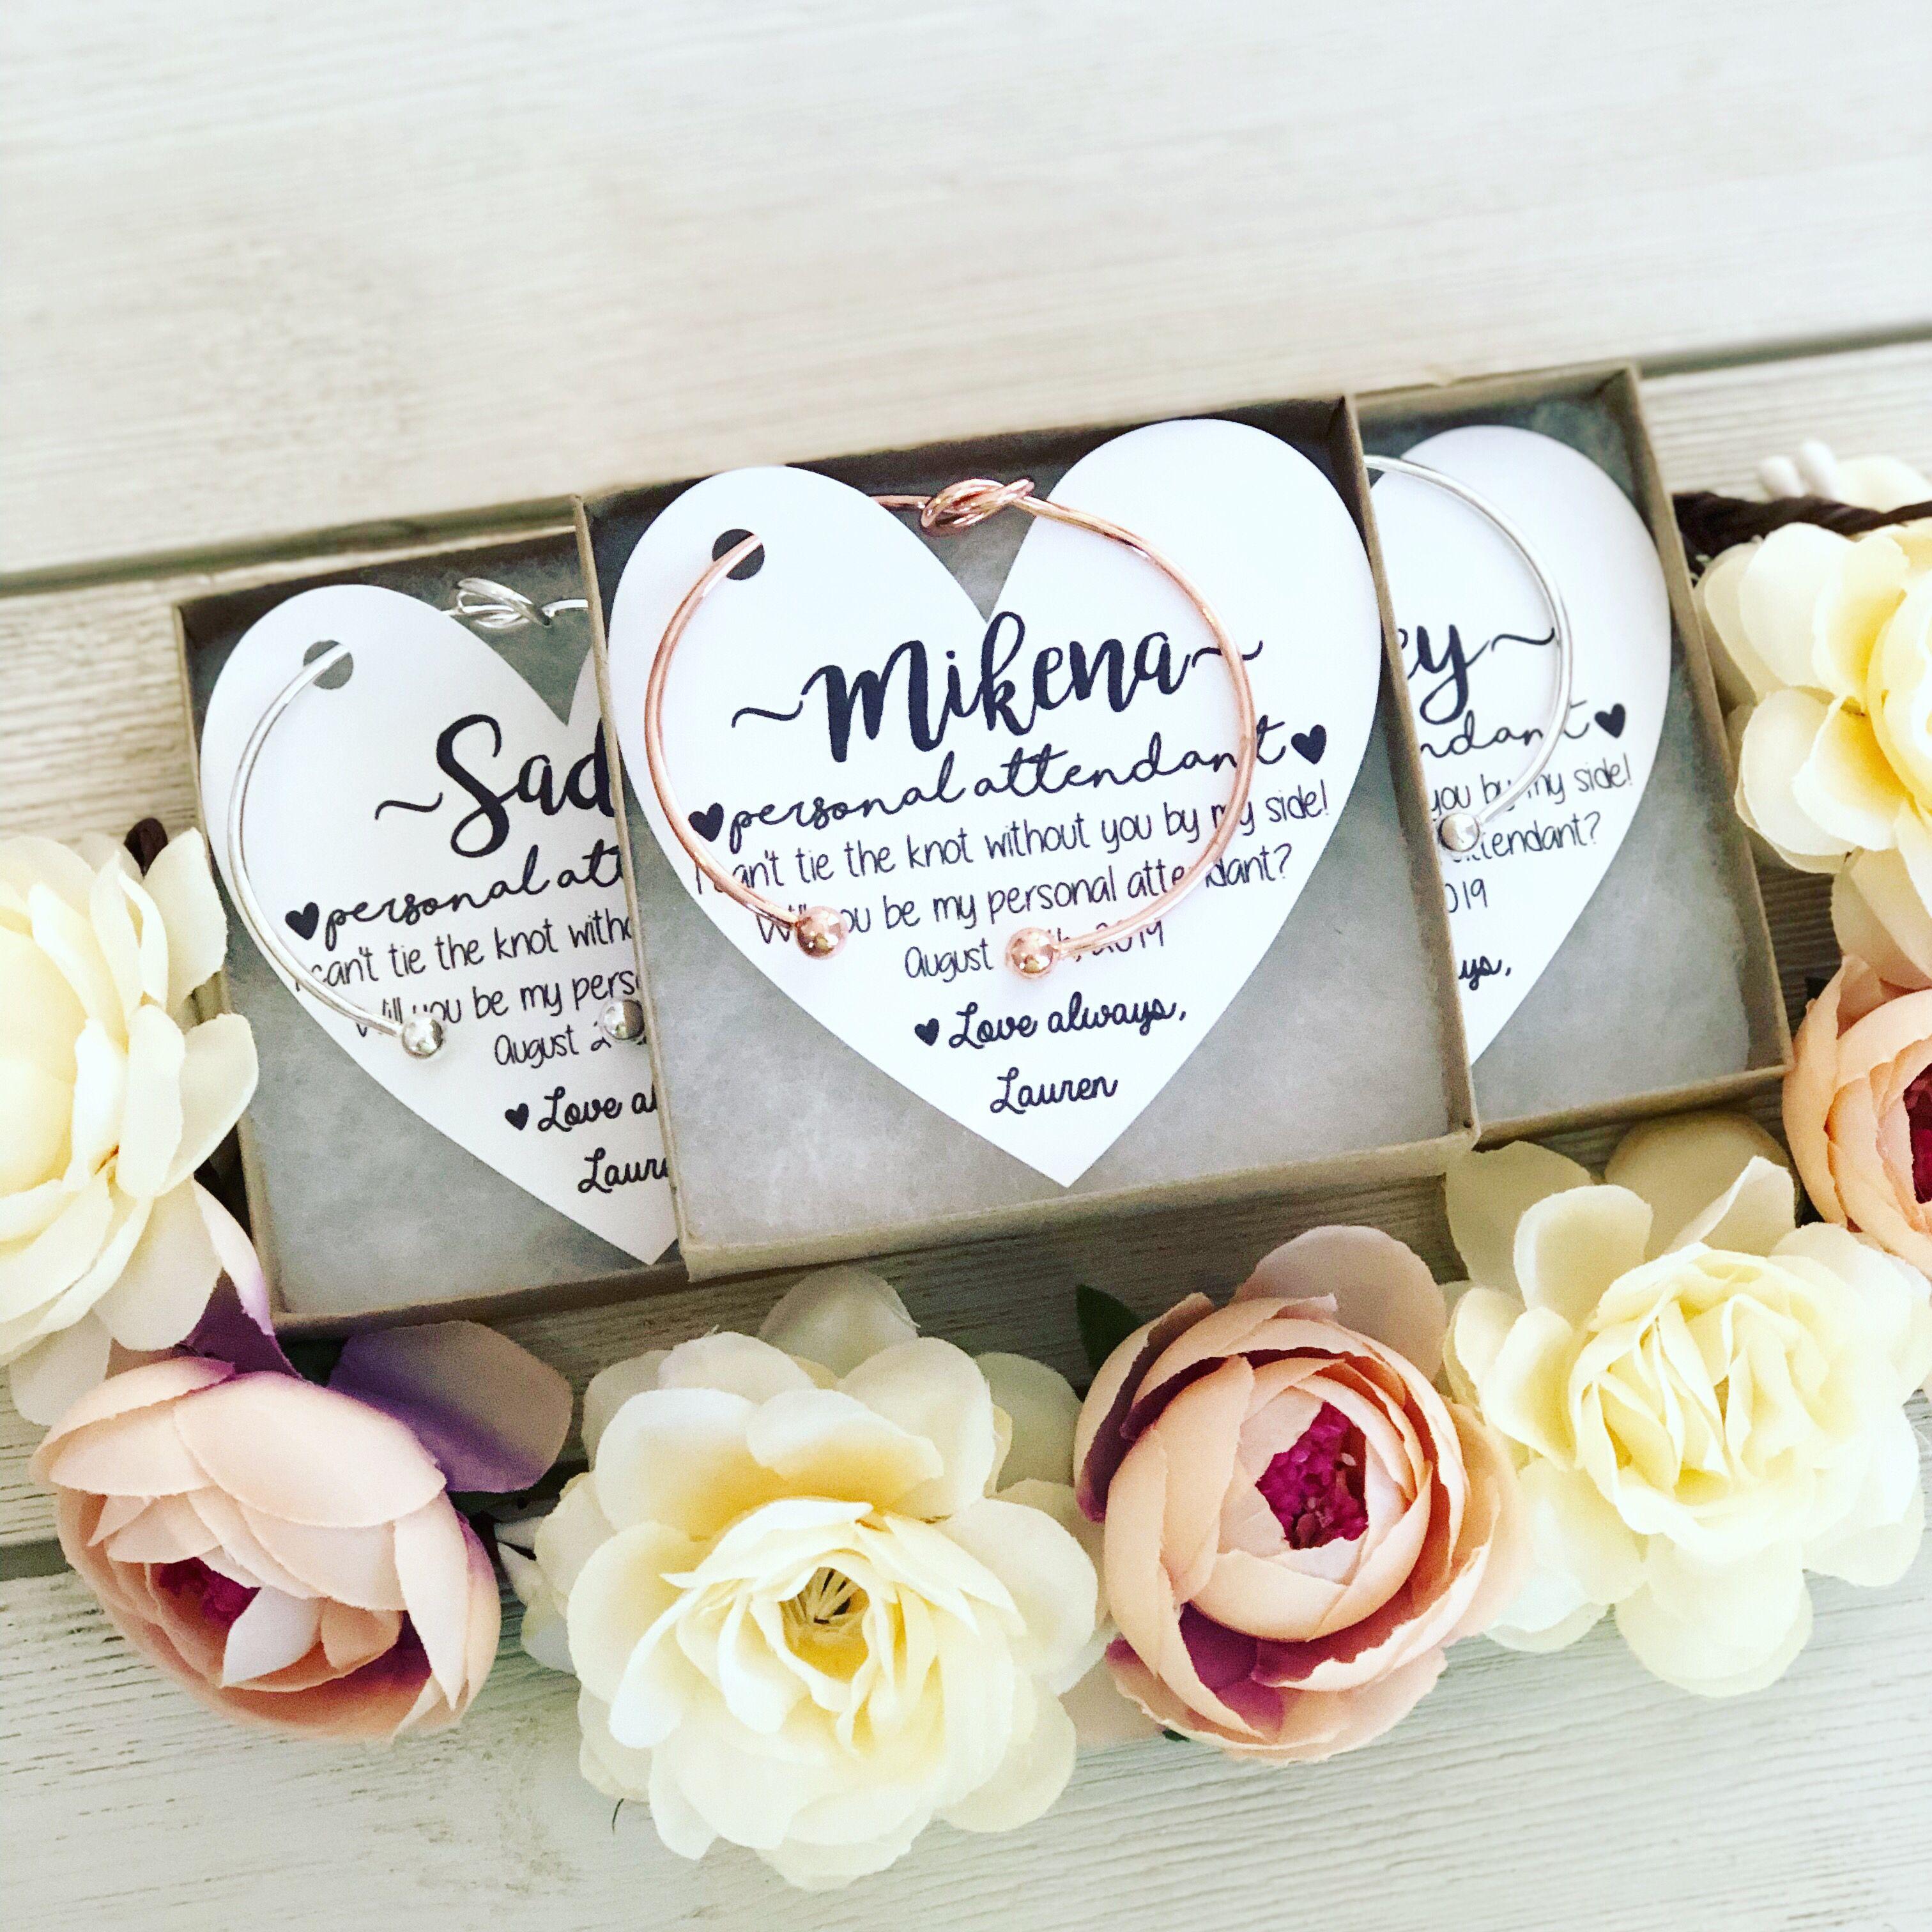 Wedding Attendants Gifts: Wedding Attendant Gifts, Gift